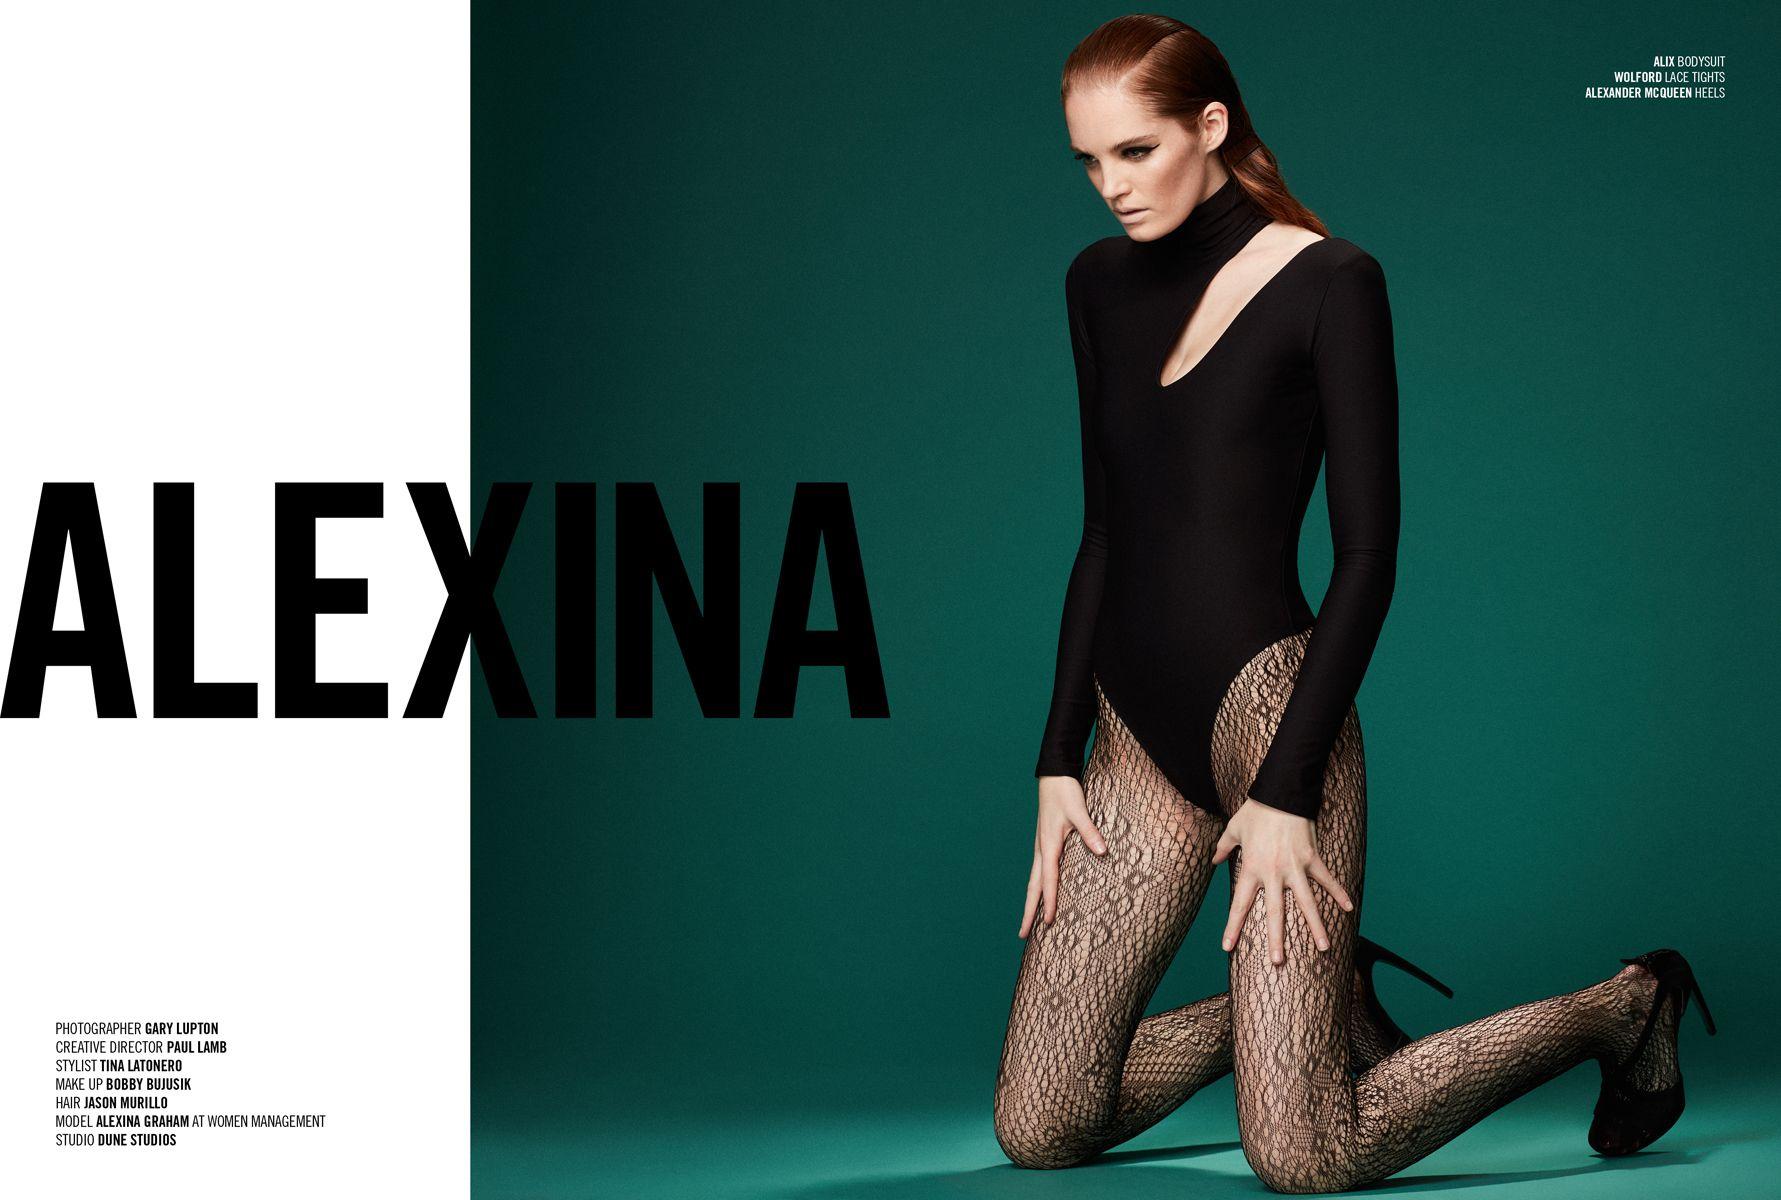 1alexina_thestory2